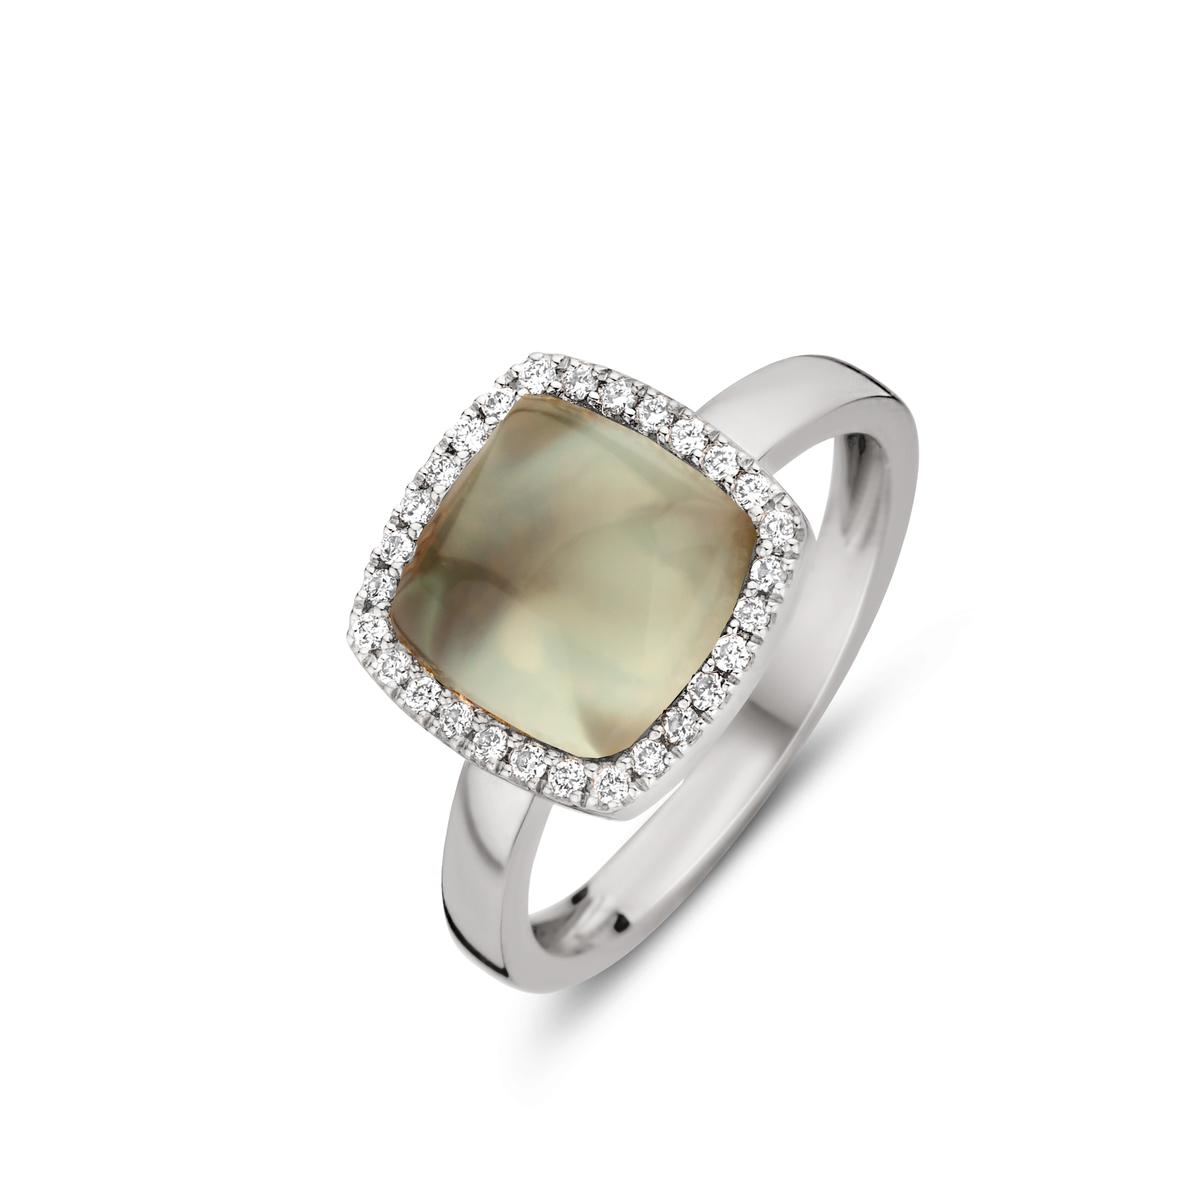 pantelleria ring in white gold